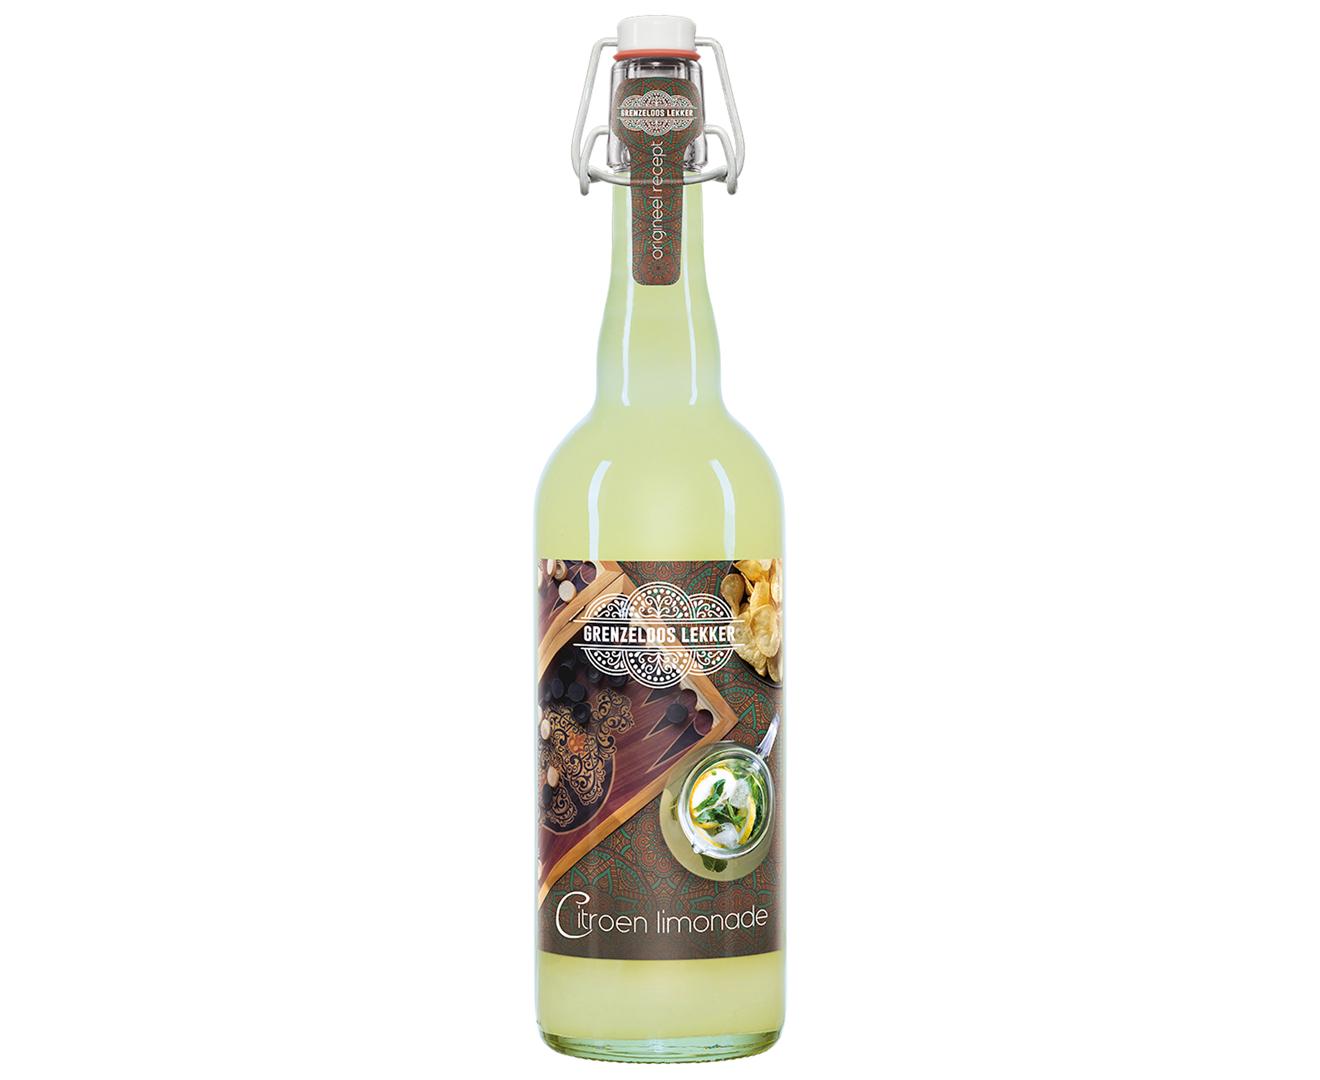 Productafbeelding Limonade Grenzeloos lekker 750ml fles